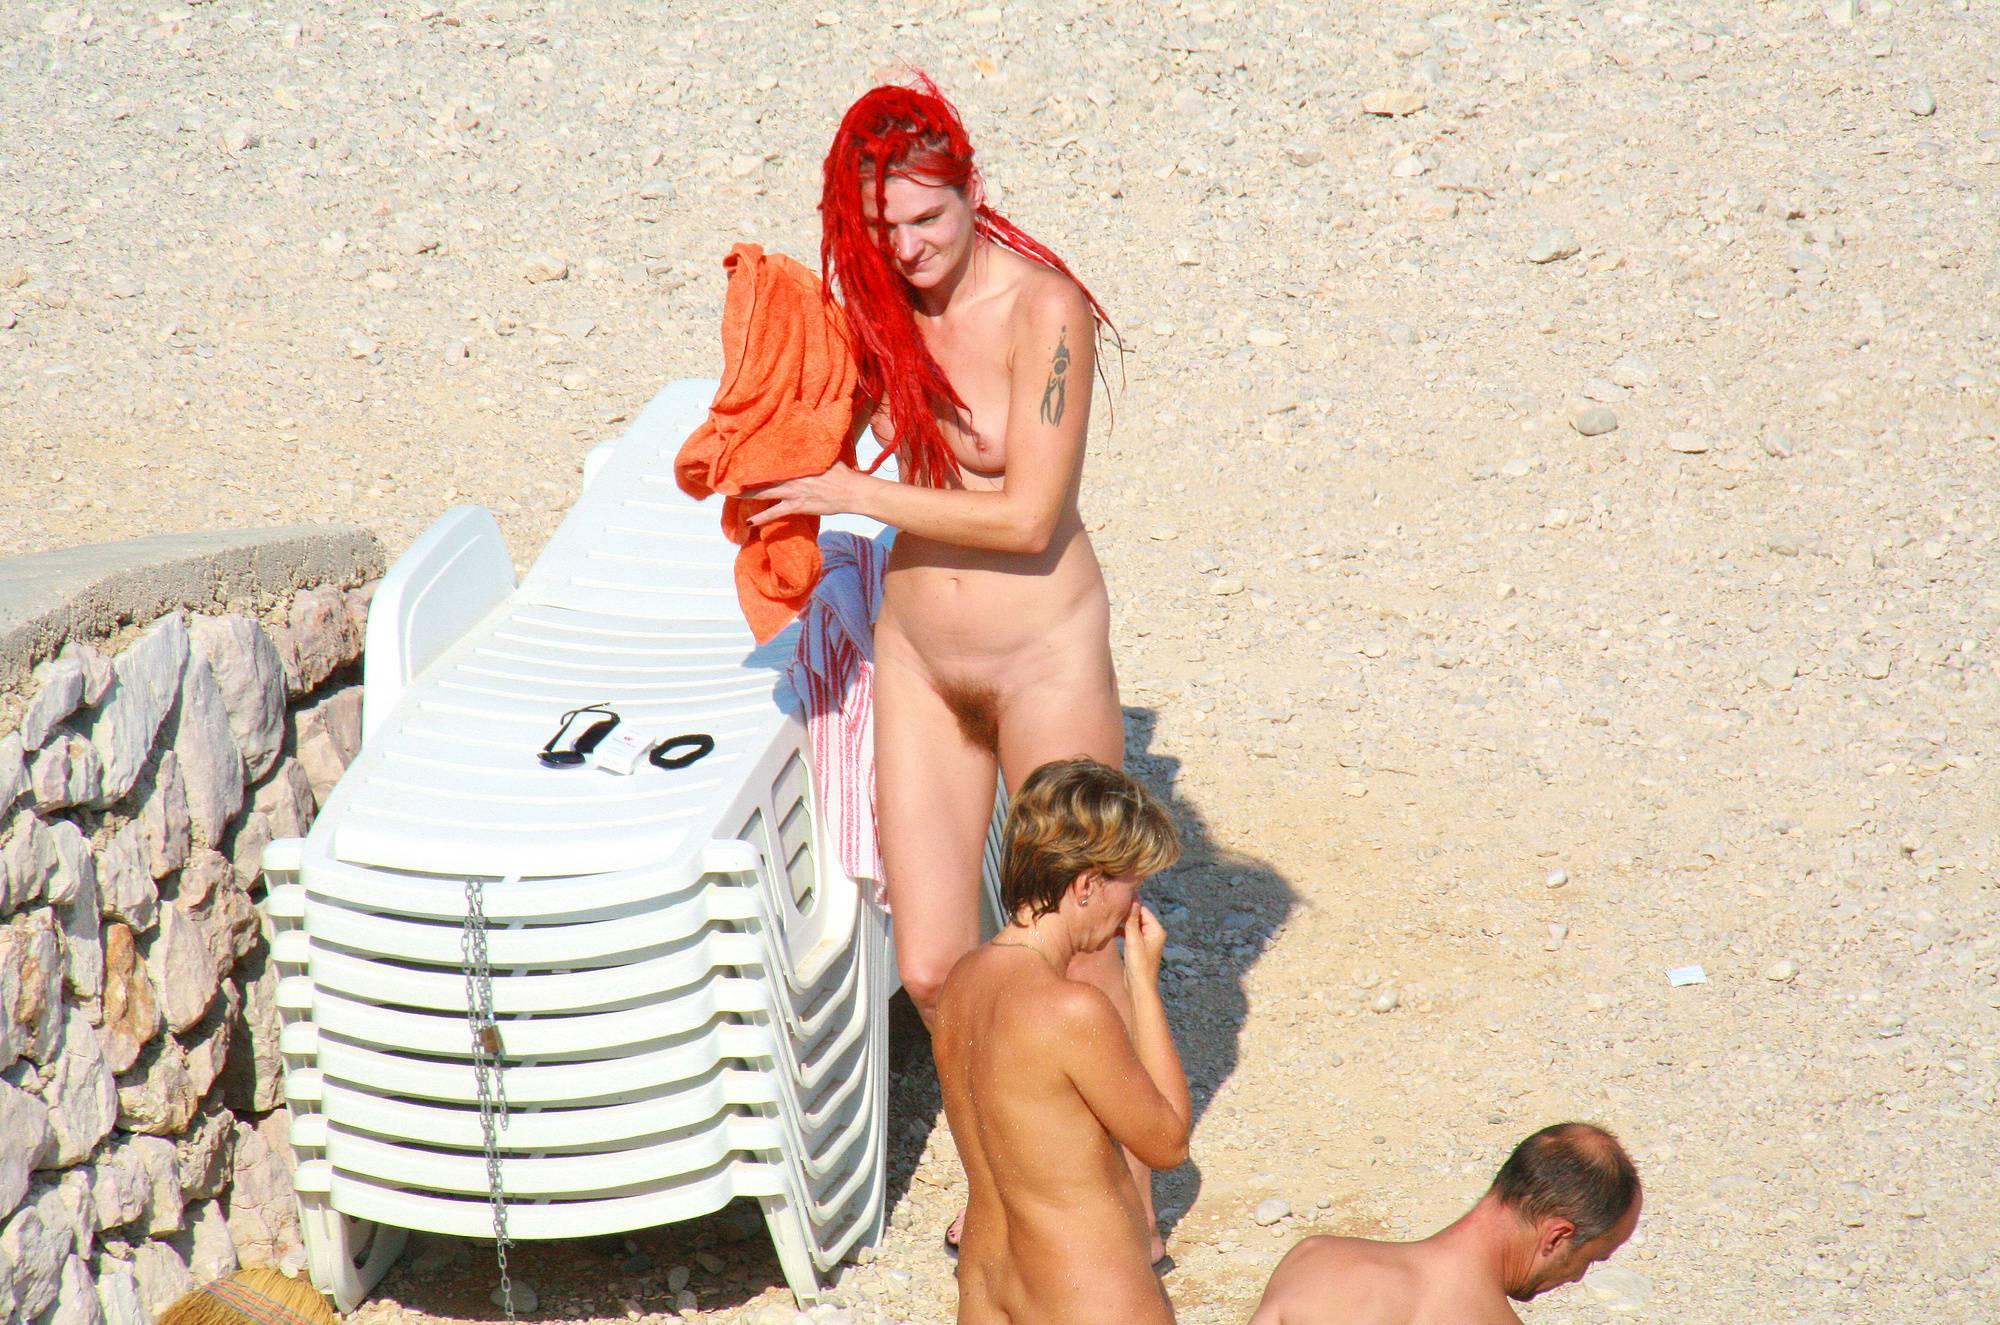 Ula FKK Red Hairstyle Girl - 1